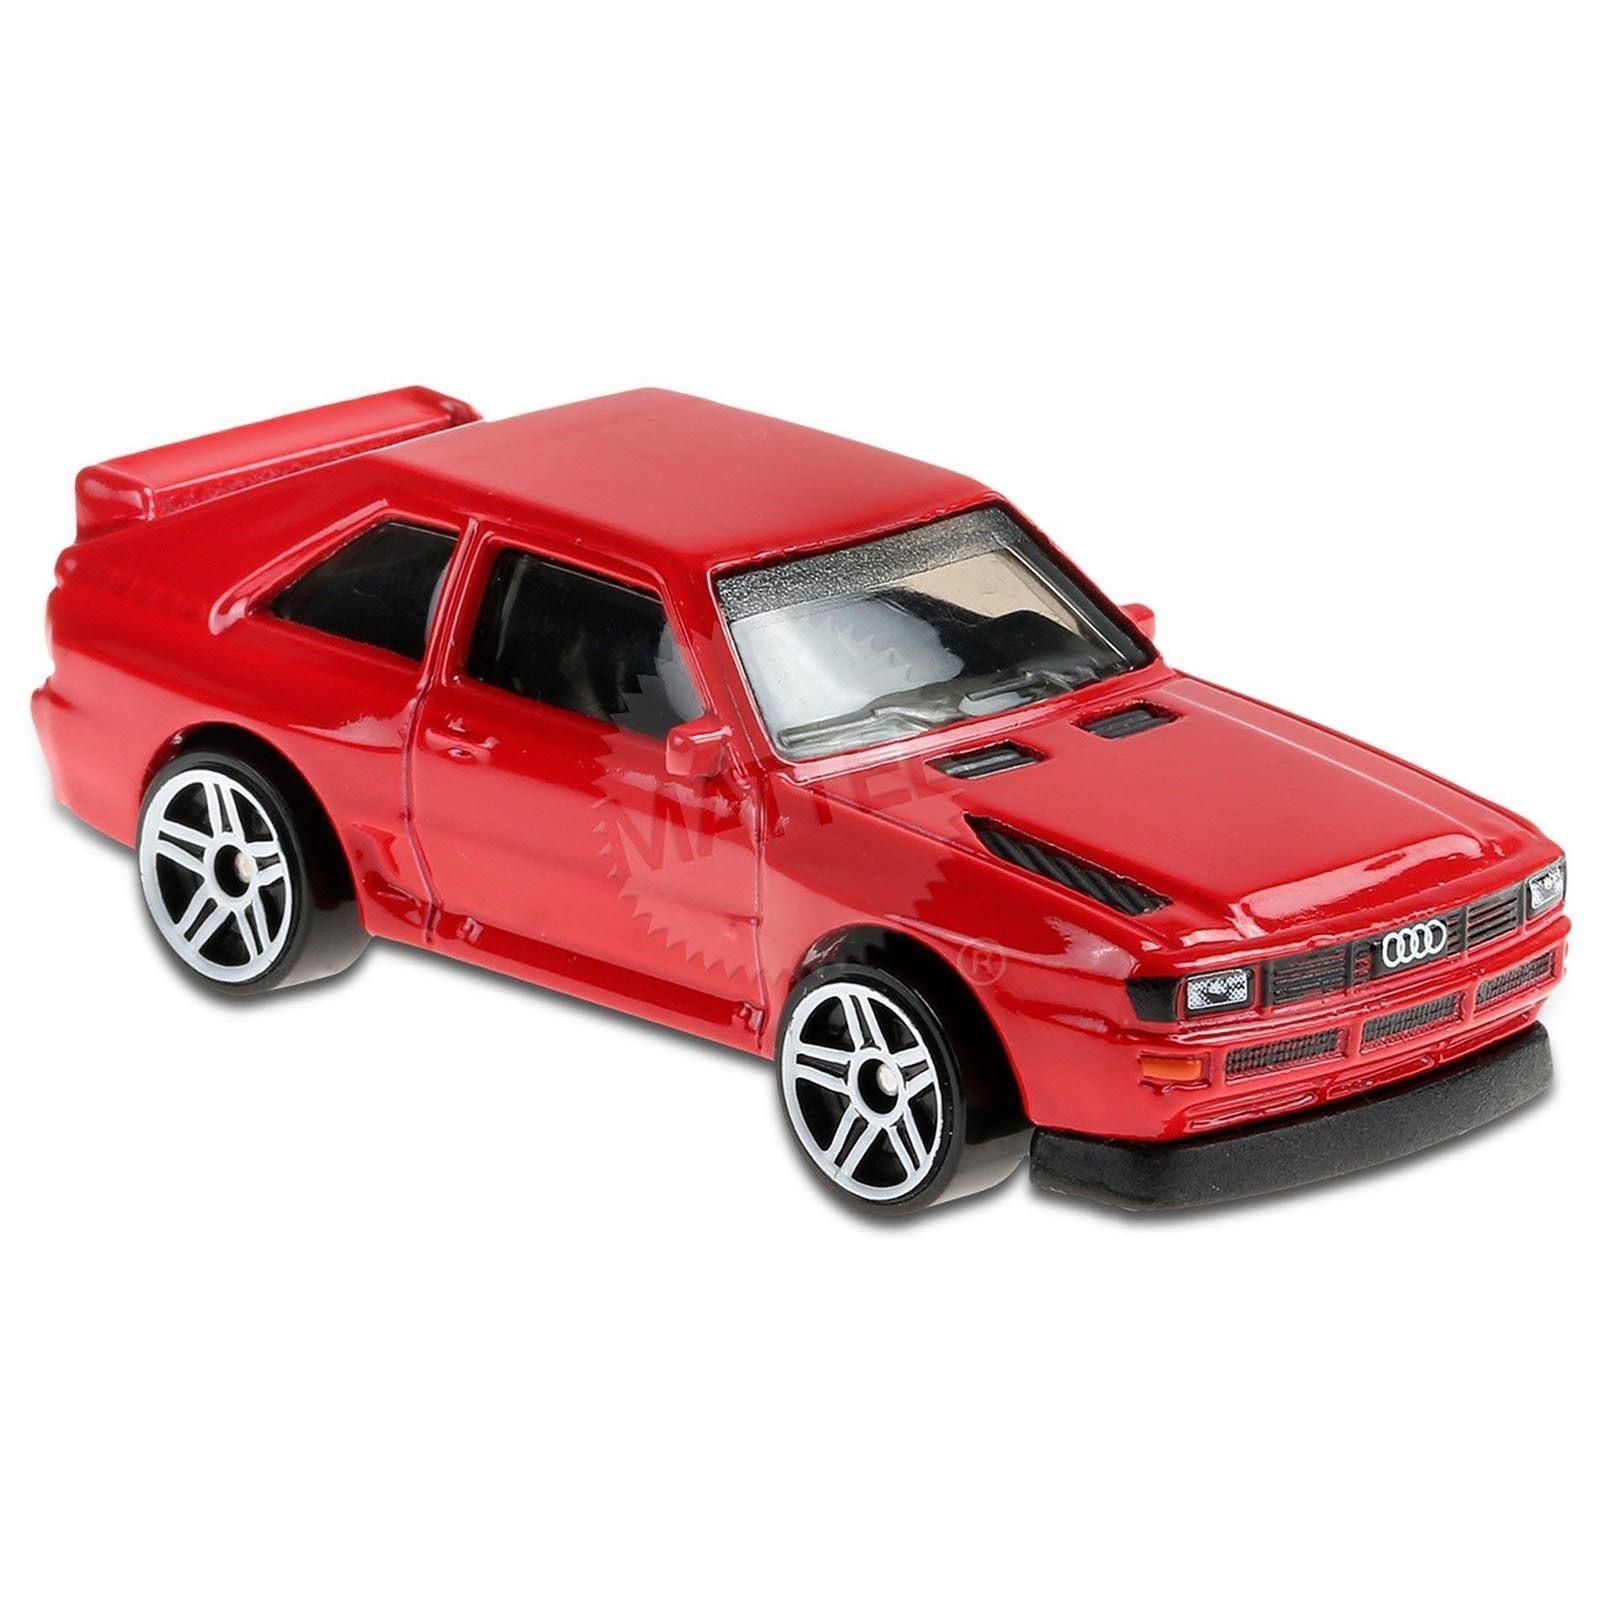 Carrinho Hot Wheels '84 Audi Sport Quattro (JJYXG) Factory Fresh